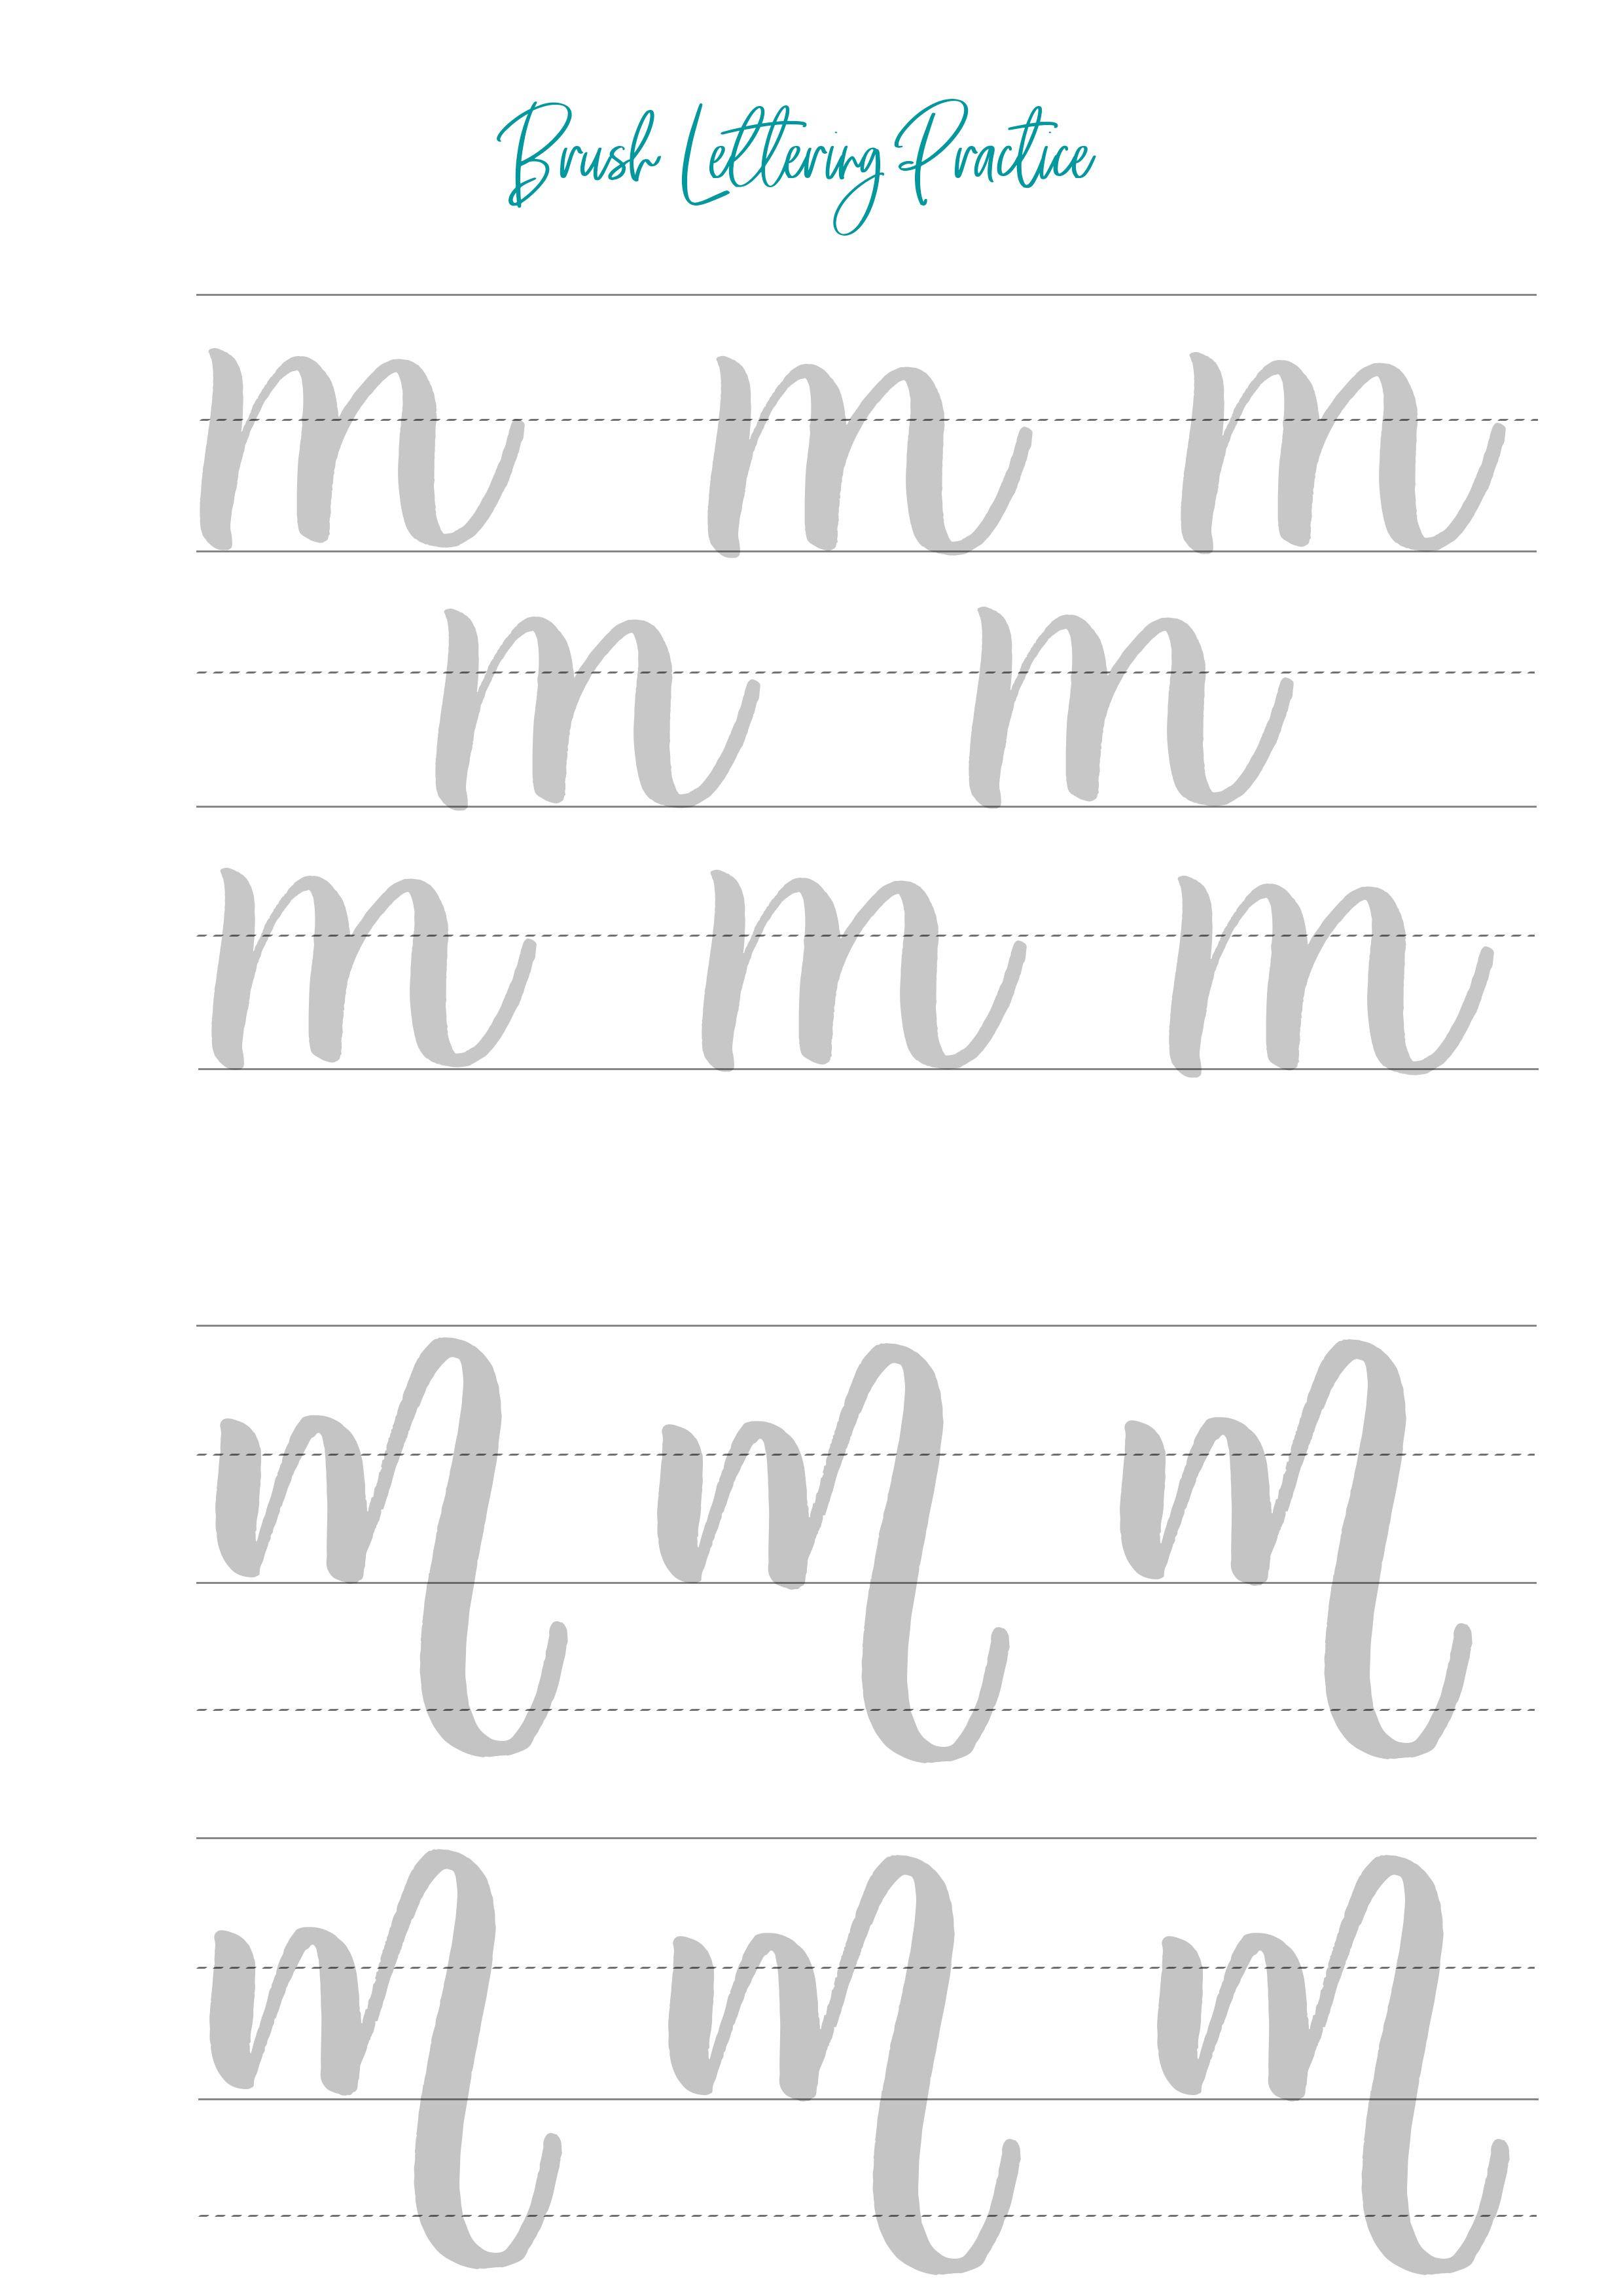 Brush Lettering Worksheets Lowercase And Uppercase Lettering